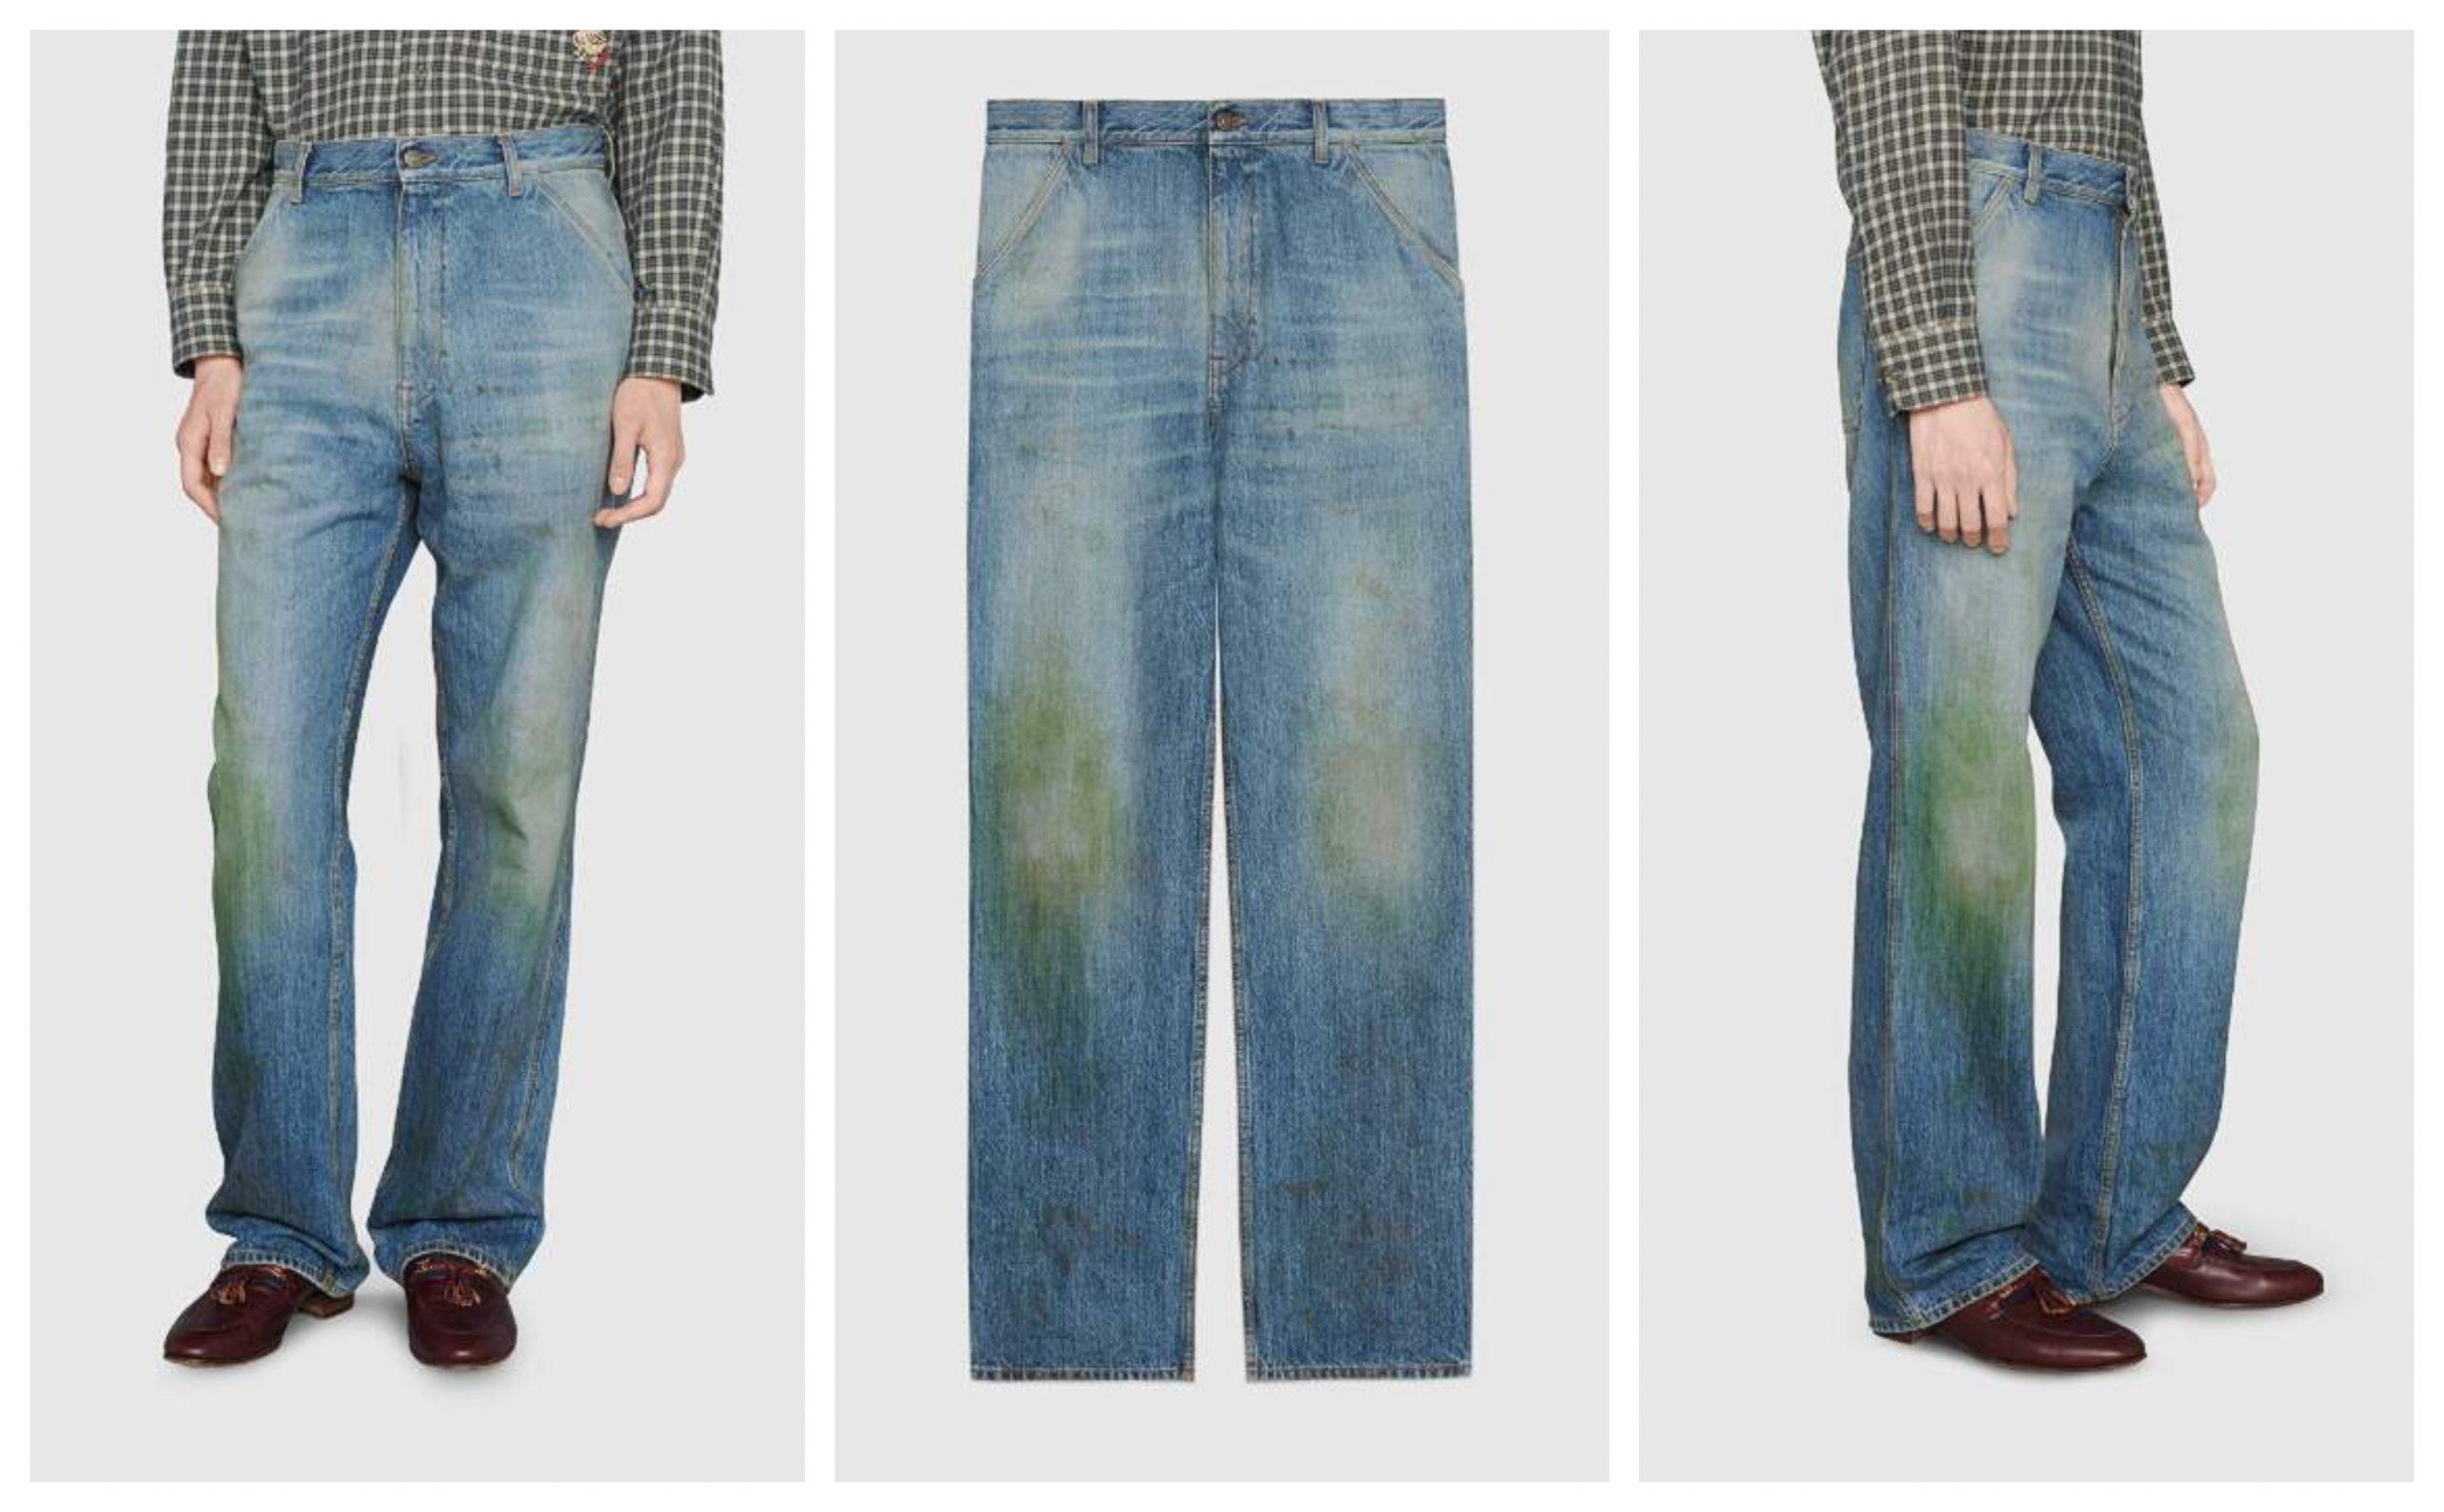 gucci jeans macchie di erba